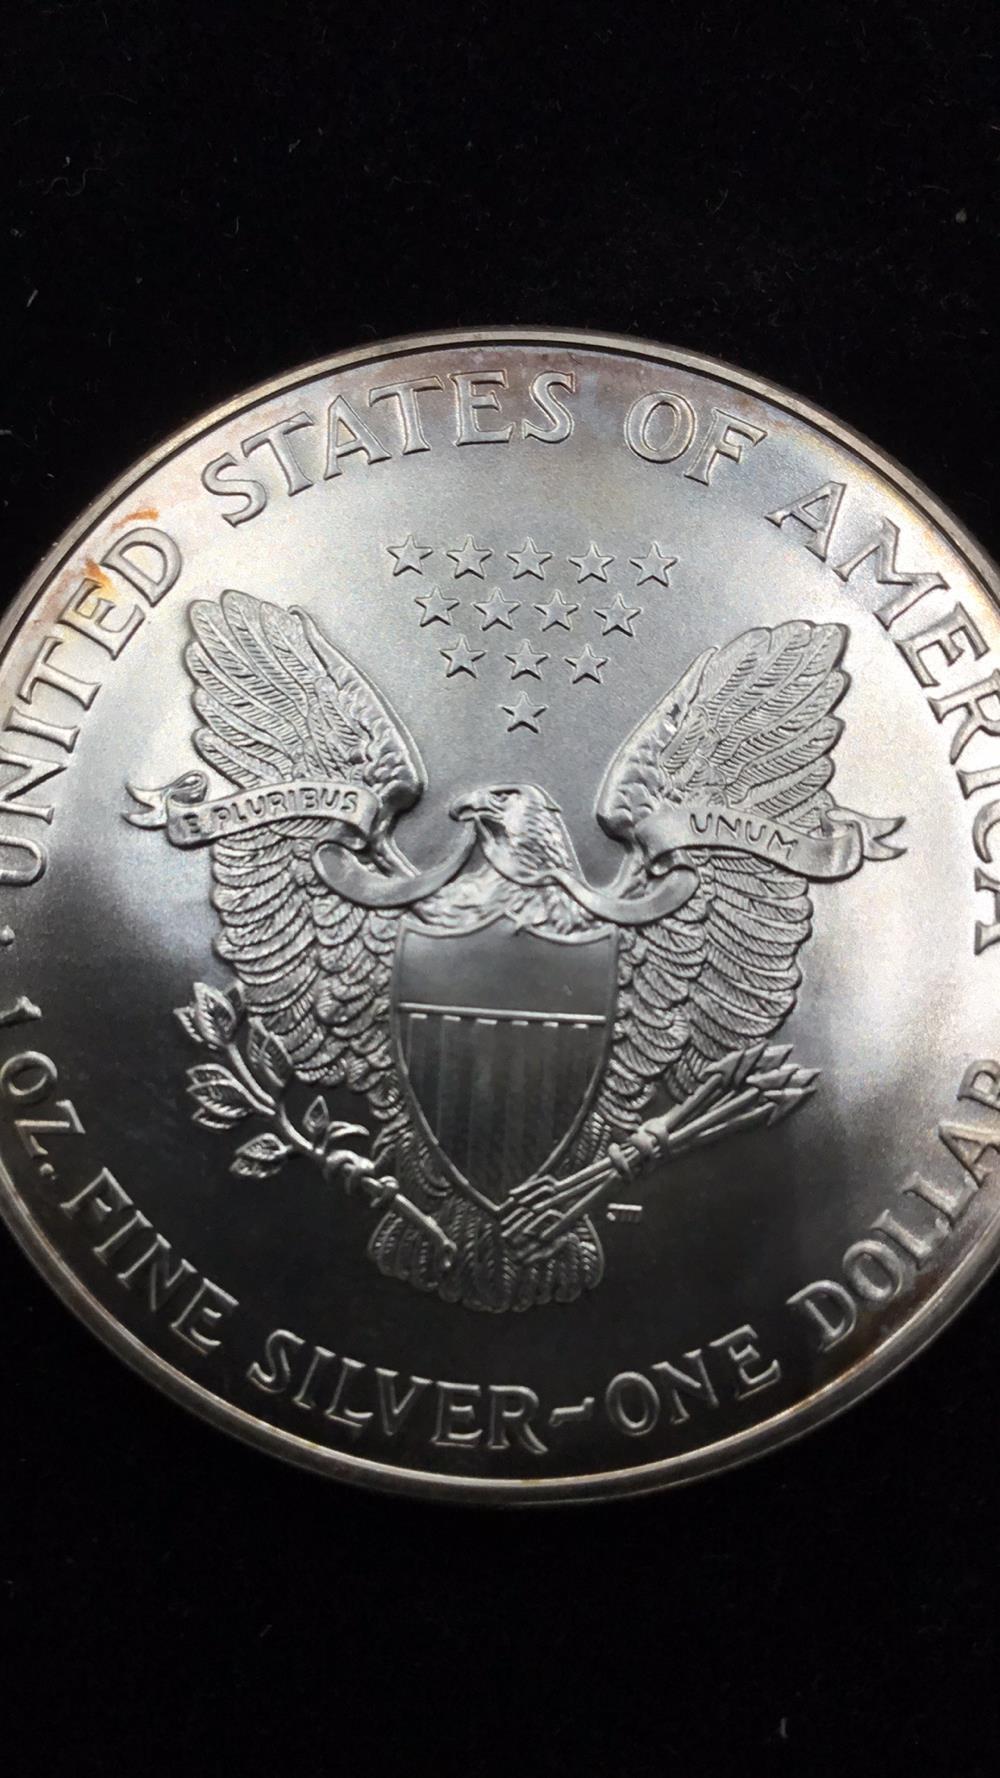 Lot 34: American eagle dollar